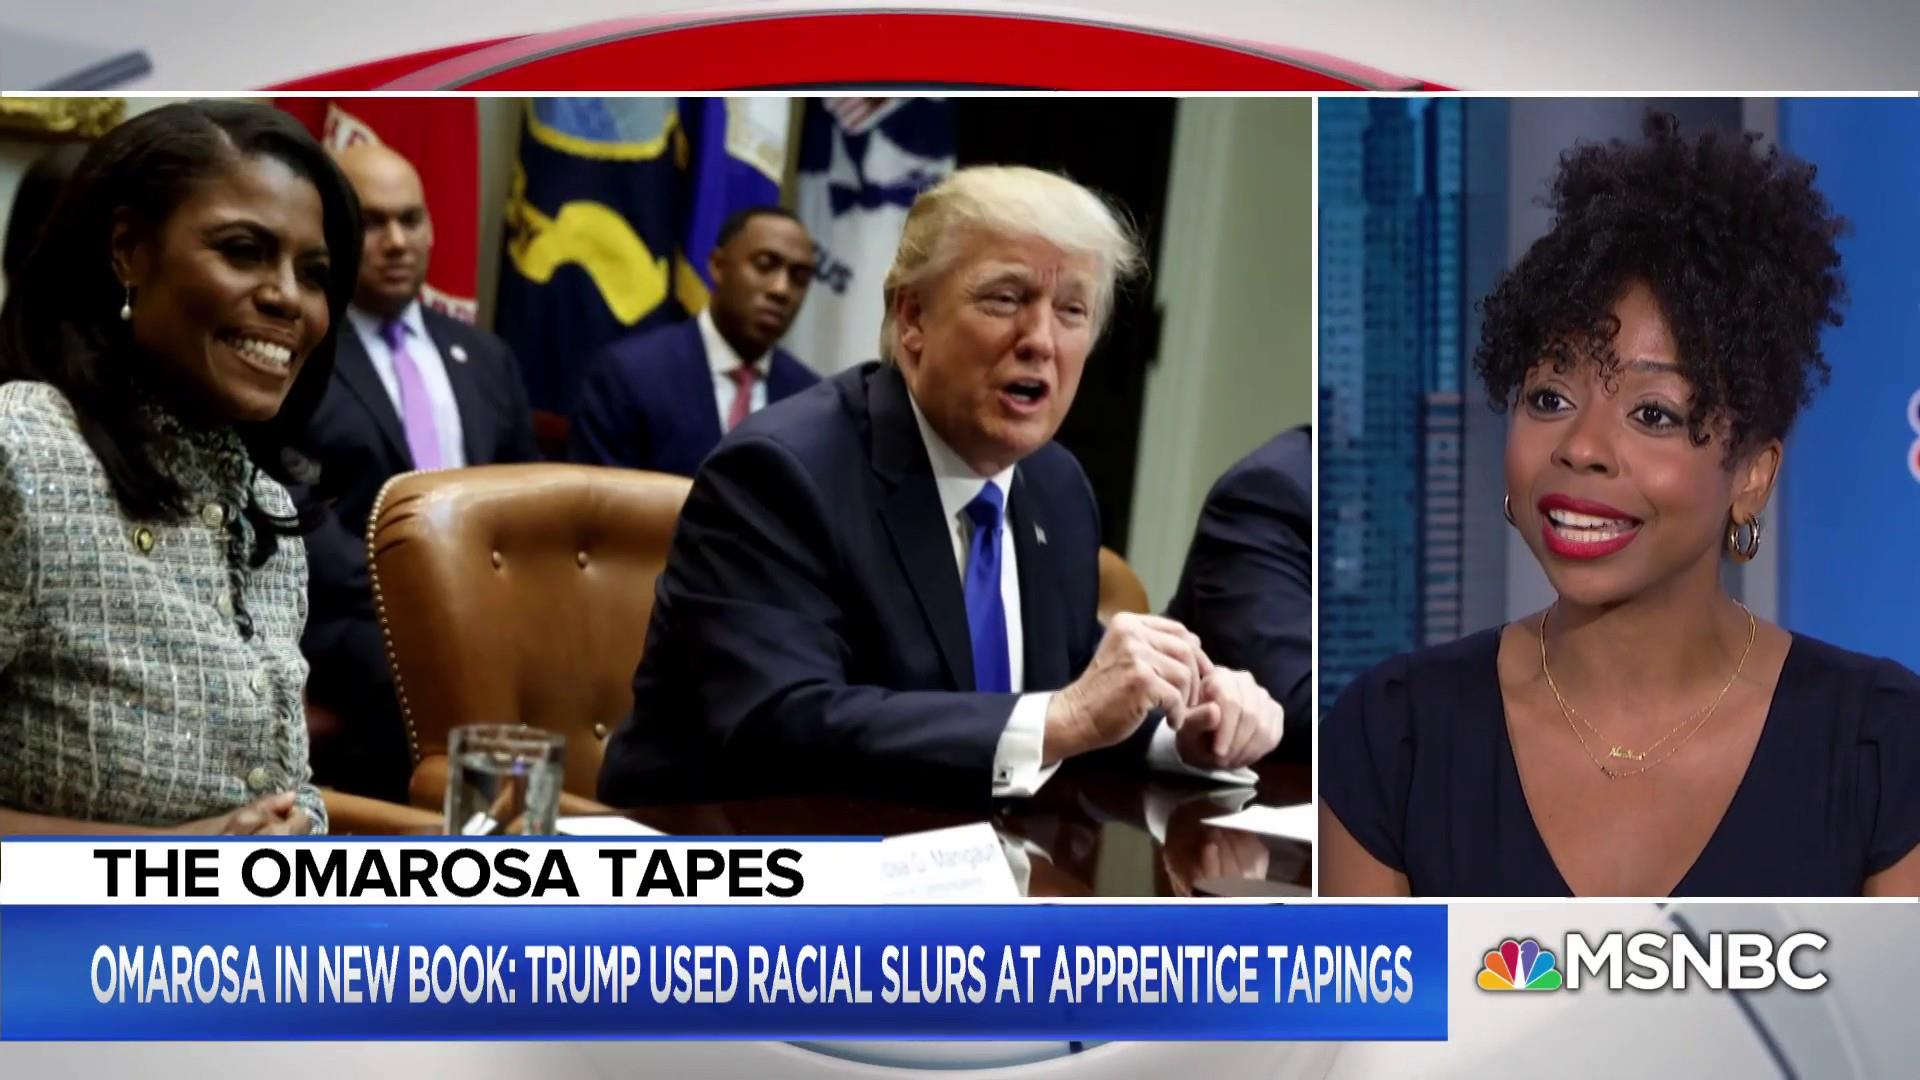 President Trump: Omarosa is a 'lowlife'